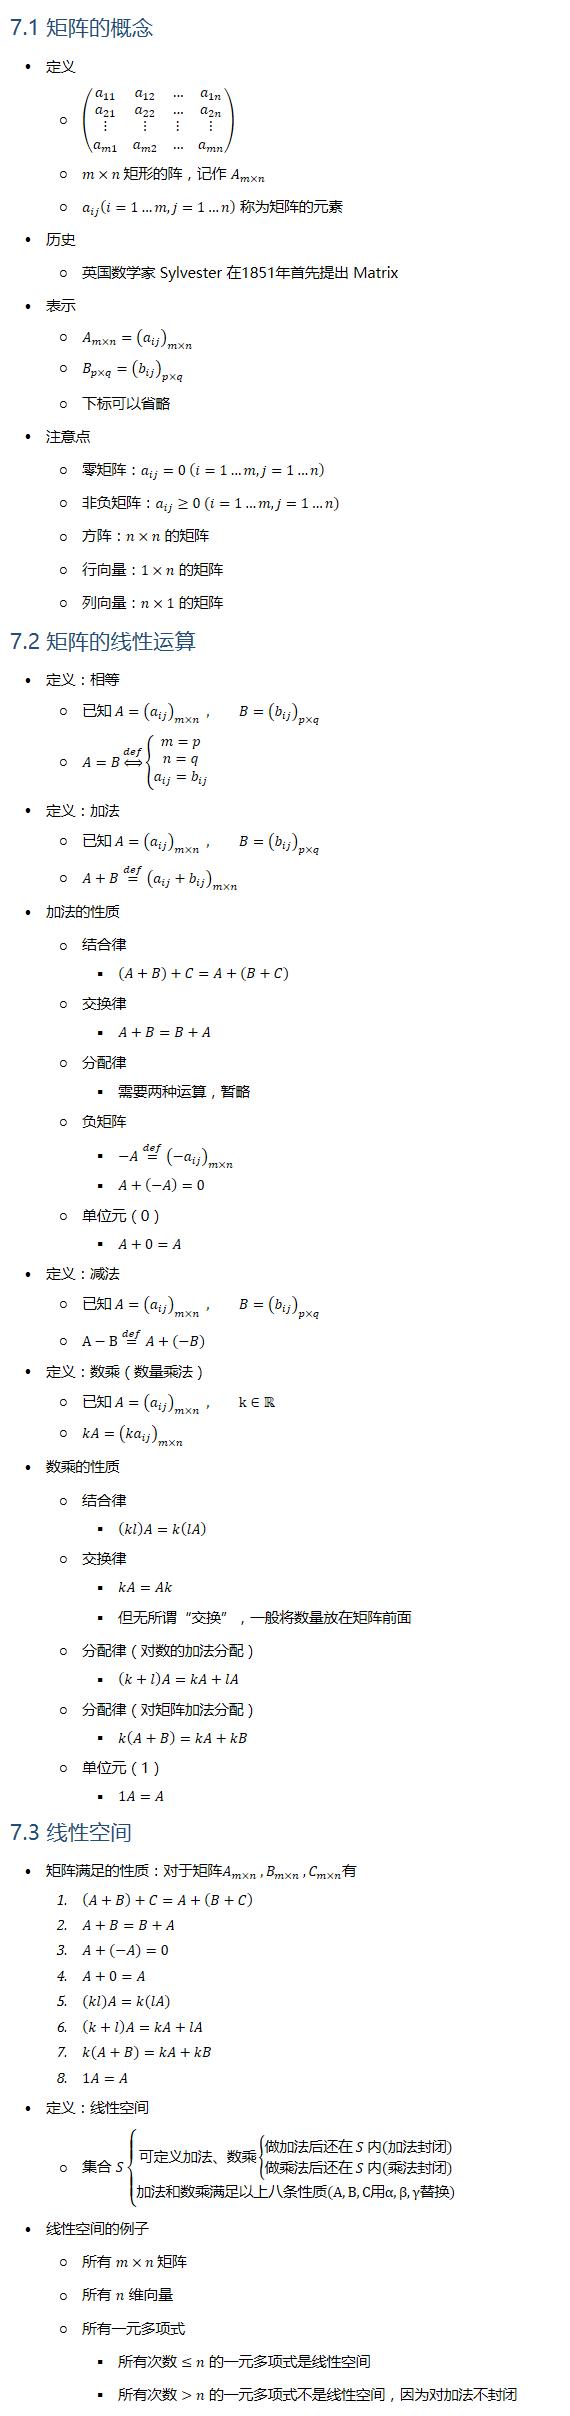 "7.1 矩阵的概念 • 定义 ○ (■8(a_11&a_12&…&a_1n@a_21&a_22&…&a_2n@⋮&⋮&⋮&⋮@a_m1&a_m2&…&a_mn )) ○ m×n 矩形的阵,记作 A_(m×n) ○ a_ij (i=1…m,j=1…n) 称为矩阵的元素 • 历史 ○ 英国数学家 Sylvester 在1851年首先提出 Matrix • 表示 ○ A_(m×n)=(a_ij )_(m×n) ○ B_(p×q)=(b_ij )_(p×q) ○ 下标可以省略 • 注意点 ○ 零矩阵:a_ij=0 (i=1…m,j=1…n) ○ 非负矩阵:a_ij≥0 (i=1…m,j=1…n) ○ 方阵:n×n 的矩阵 ○ 行向量:1×n 的矩阵 ○ 列向量:n×1 的矩阵 7.2 矩阵的线性运算 • 定义:相等 ○ 已知 A=(a_ij )_(m×n) , B=(b_ij )_(p×q) ○ A=B⇔┴def {█(m=p@n=q@a_ij=b_ij )┤ • 定义:加法 ○ 已知 A=(a_ij )_(m×n) , B=(b_ij )_(p×q) ○ A+B=┴def (a_ij+b_ij )_(m×n) • 加法的性质 ○ 结合律 § (A+B)+C=A+(B+C) ○ 交换律 § A+B=B+A ○ 分配律 § 需要两种运算,暂略 ○ 负矩阵 § −A=┴def (−a_ij )_(m×n) § A+(−A)=0 ○ 单位元(0) § A+0=A • 定义:减法 ○ 已知 A=(a_ij )_(m×n) , B=(b_ij )_(p×q) ○ A−B=┴def A+(−B) • 定义:数乘(数量乘法) ○ 已知 A=(a_ij )_(m×n) , k∈R ○ kA=(〖ka〗_ij )_(m×n) • 数乘的性质 ○ 结合律 § (kl)A=k(lA) ○ 交换律 § kA=Ak § 但无所谓""交换"",一般将数量放在矩阵前面 ○ 分配律(对数的加法分配) § (k+l)A=kA+lA ○ 分配律(对矩阵加法分配) § k(A+B)=kA+kB ○ 单位元(1) § 1A=A 7.3 线性空间 • 矩阵满足的性质:对于矩阵A_(m×n) , B_(m×n) , C_(m×n) 1. (A+B)+C=A+(B+C) 2. A+B=B+A 3. A+(−A)=0 4. A+0=A 5. (kl)A=k(lA) 6. (k+l)A=kA+lA 7. k(A+B)=kA+kB 8. 1A=A • 定义:线性空间 ○ • 线性空间的例子 ○ 所有 m×n 矩阵 ○ 所有 n 维向量 ○ 所有一元多项式 § 所有次数 ≤n 的一元多项式是线性空间 § 所有次数 n 的一元多项式不是线性空间,因为对加法不封闭"